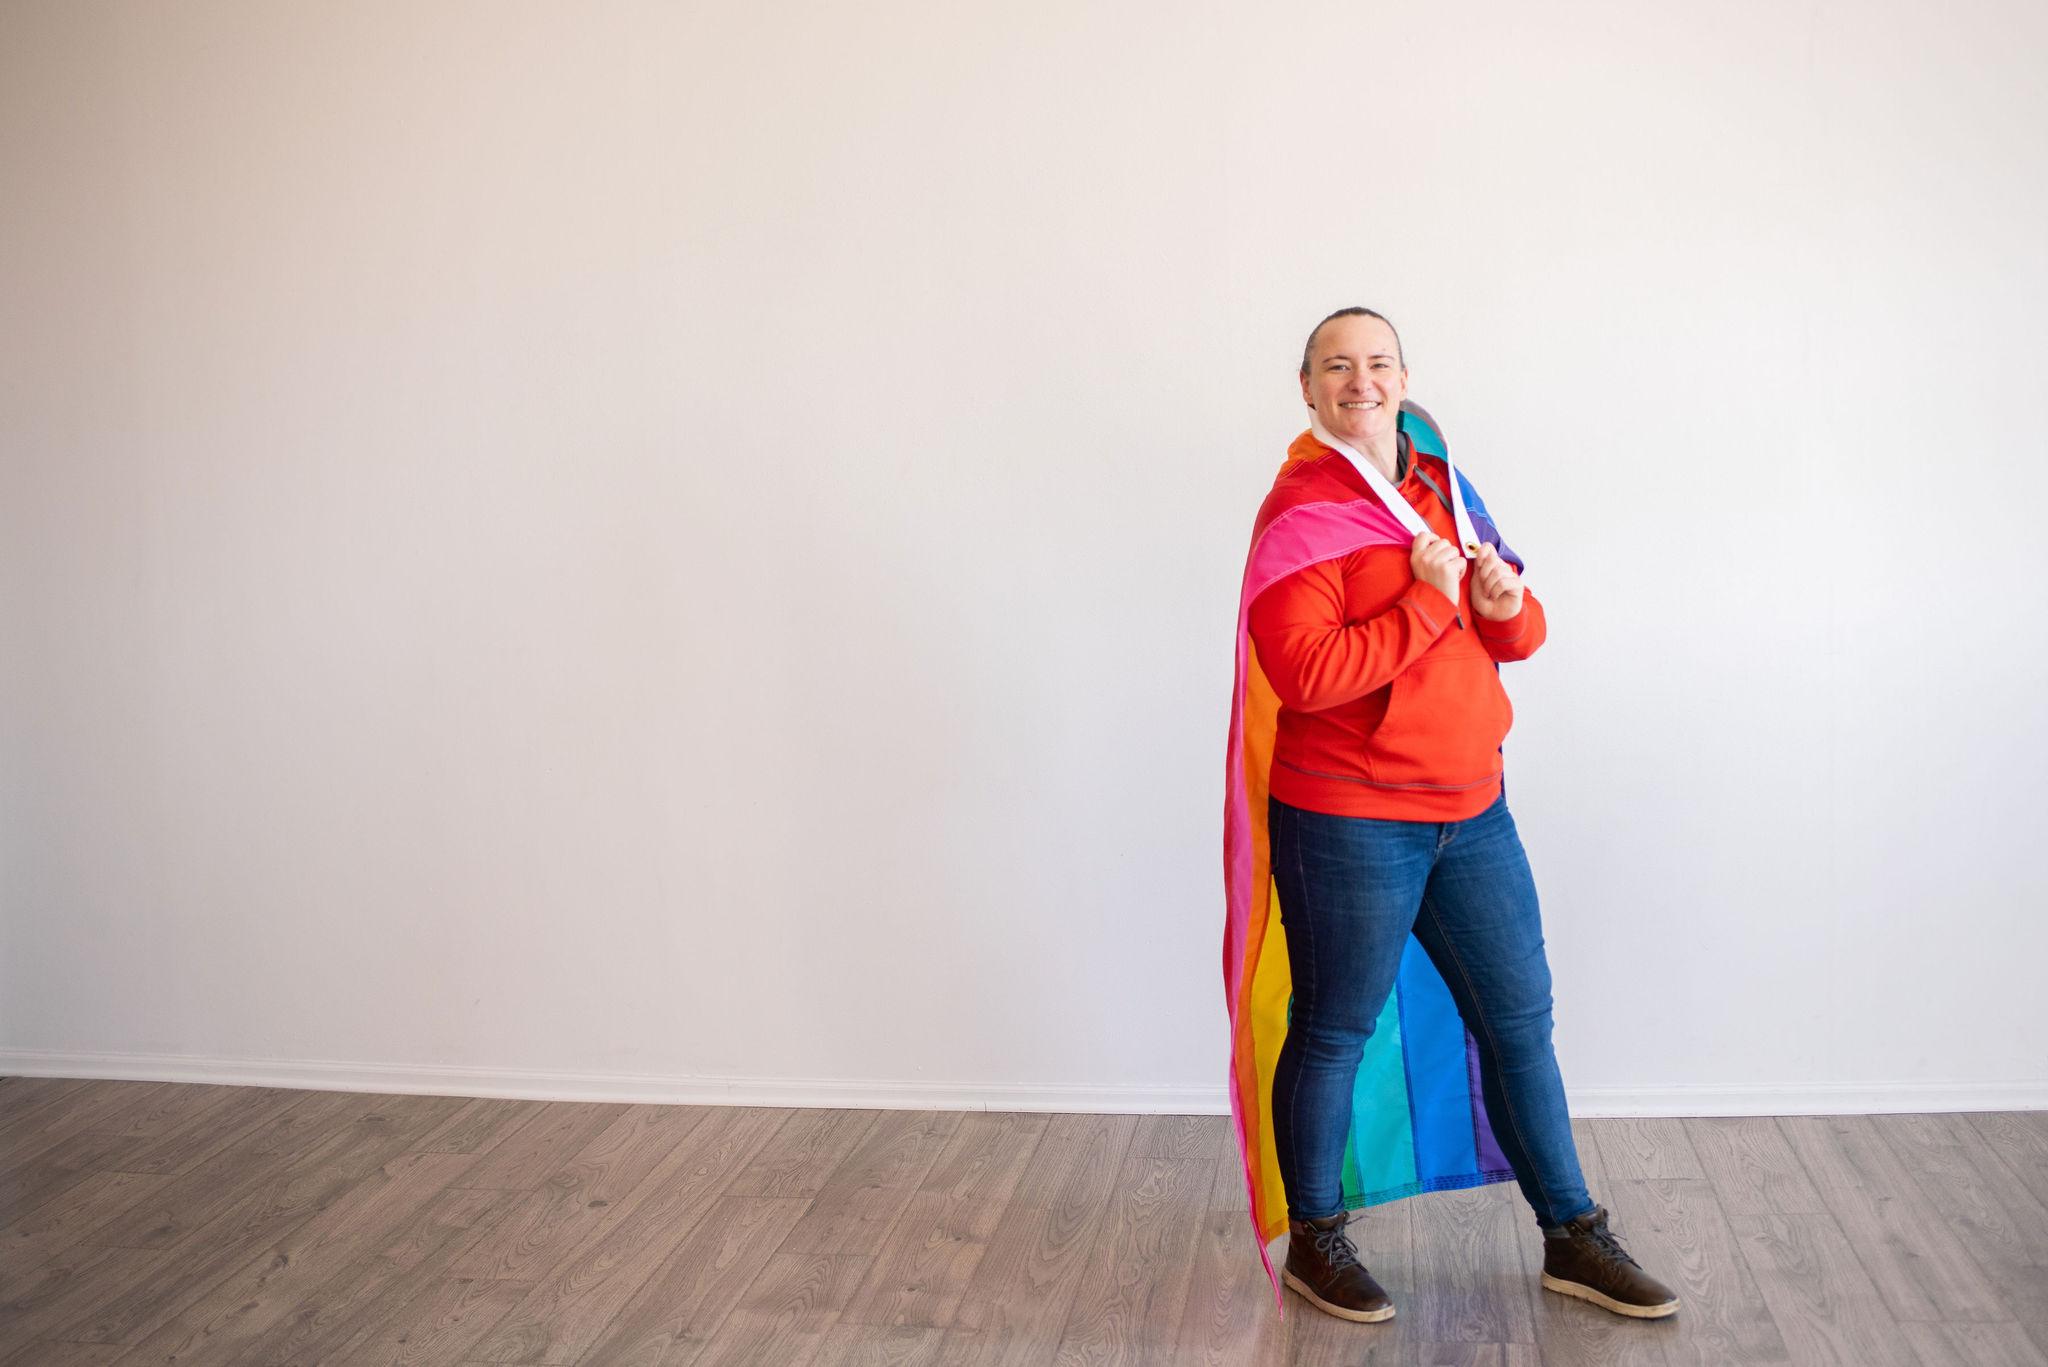 rebranding for Minneapolis Megs! The Brand business owner draped in pride flag